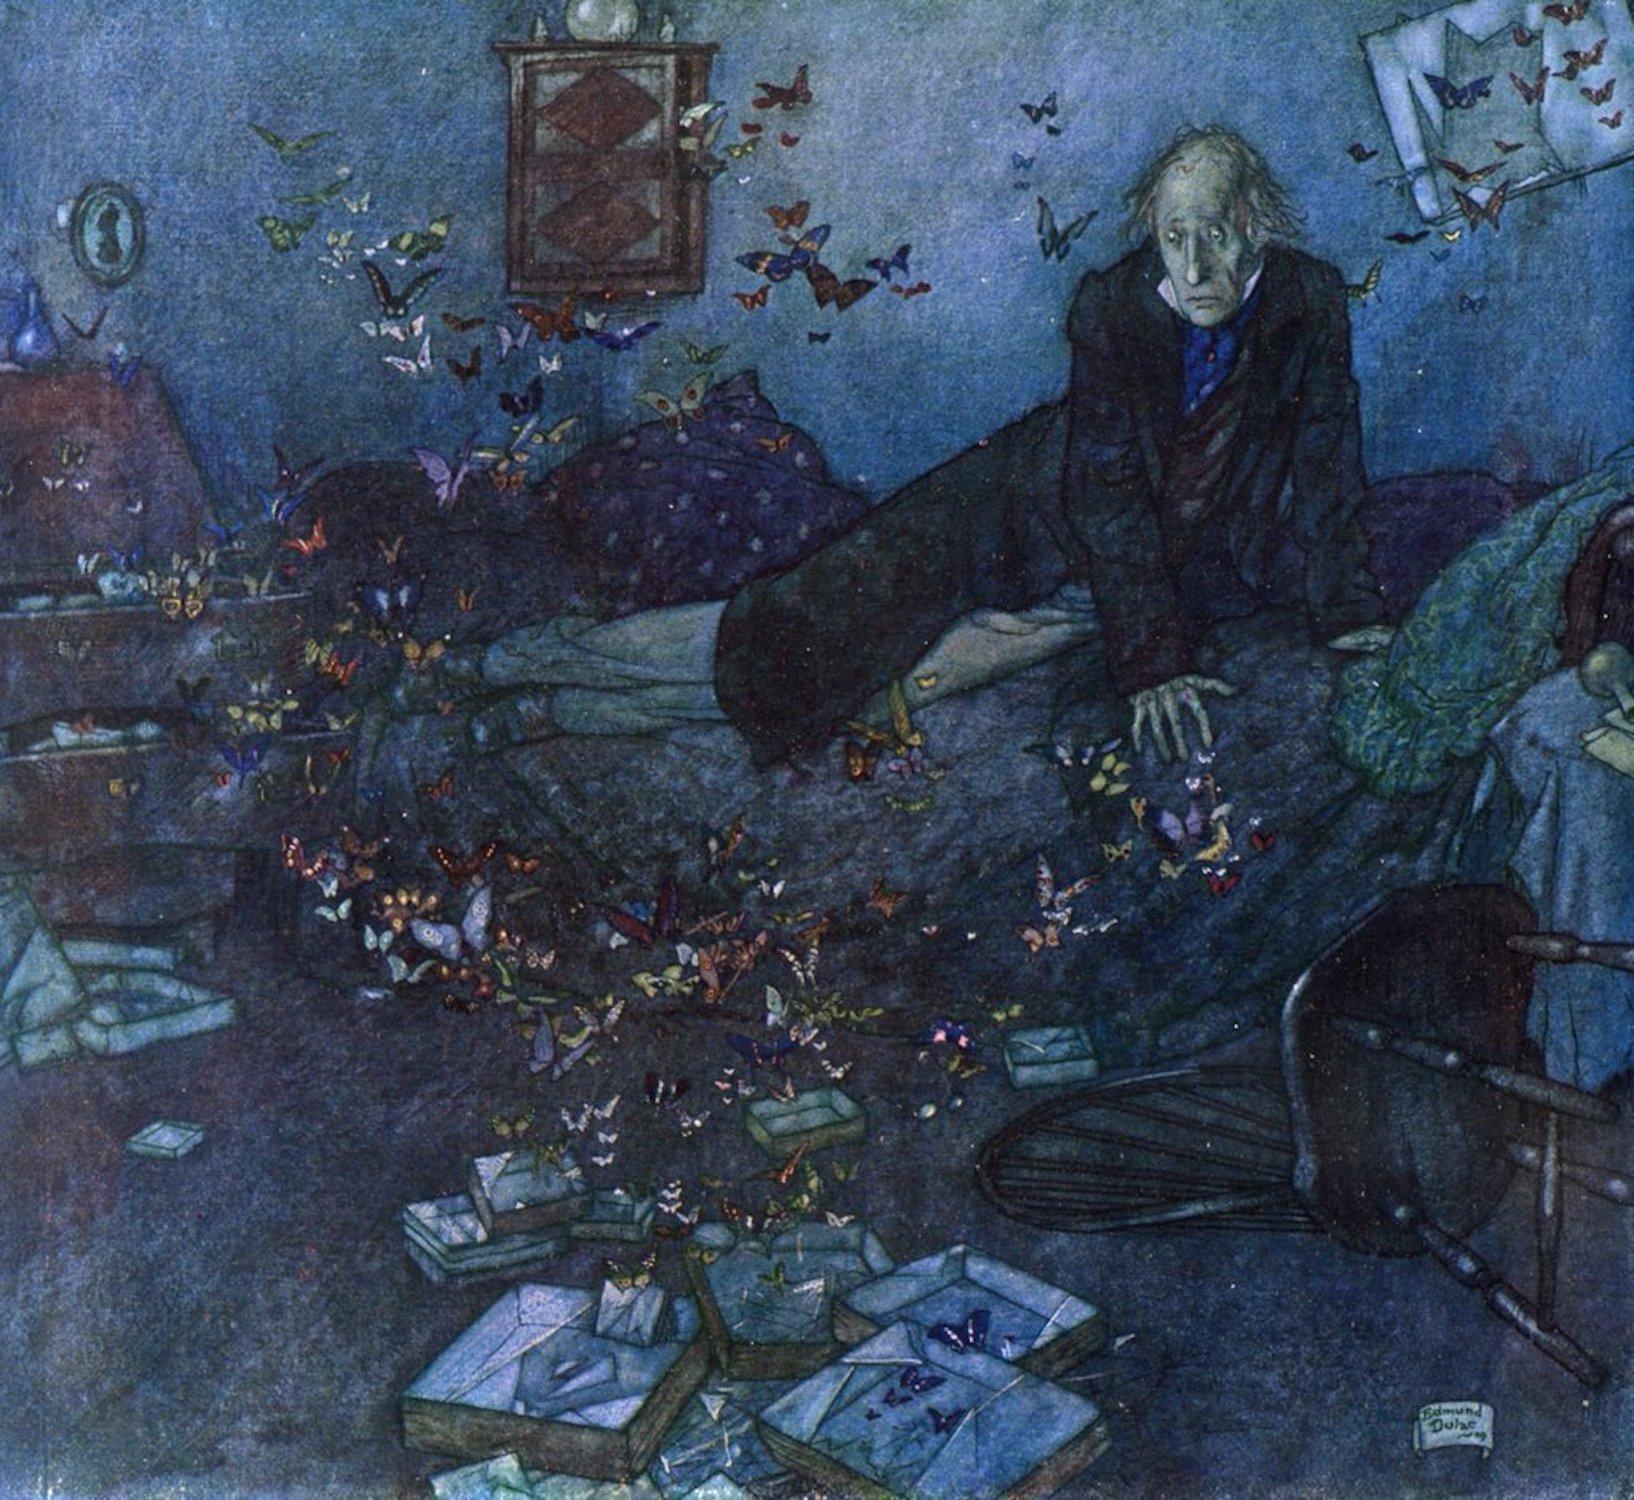 'The Entomologist's Dream'